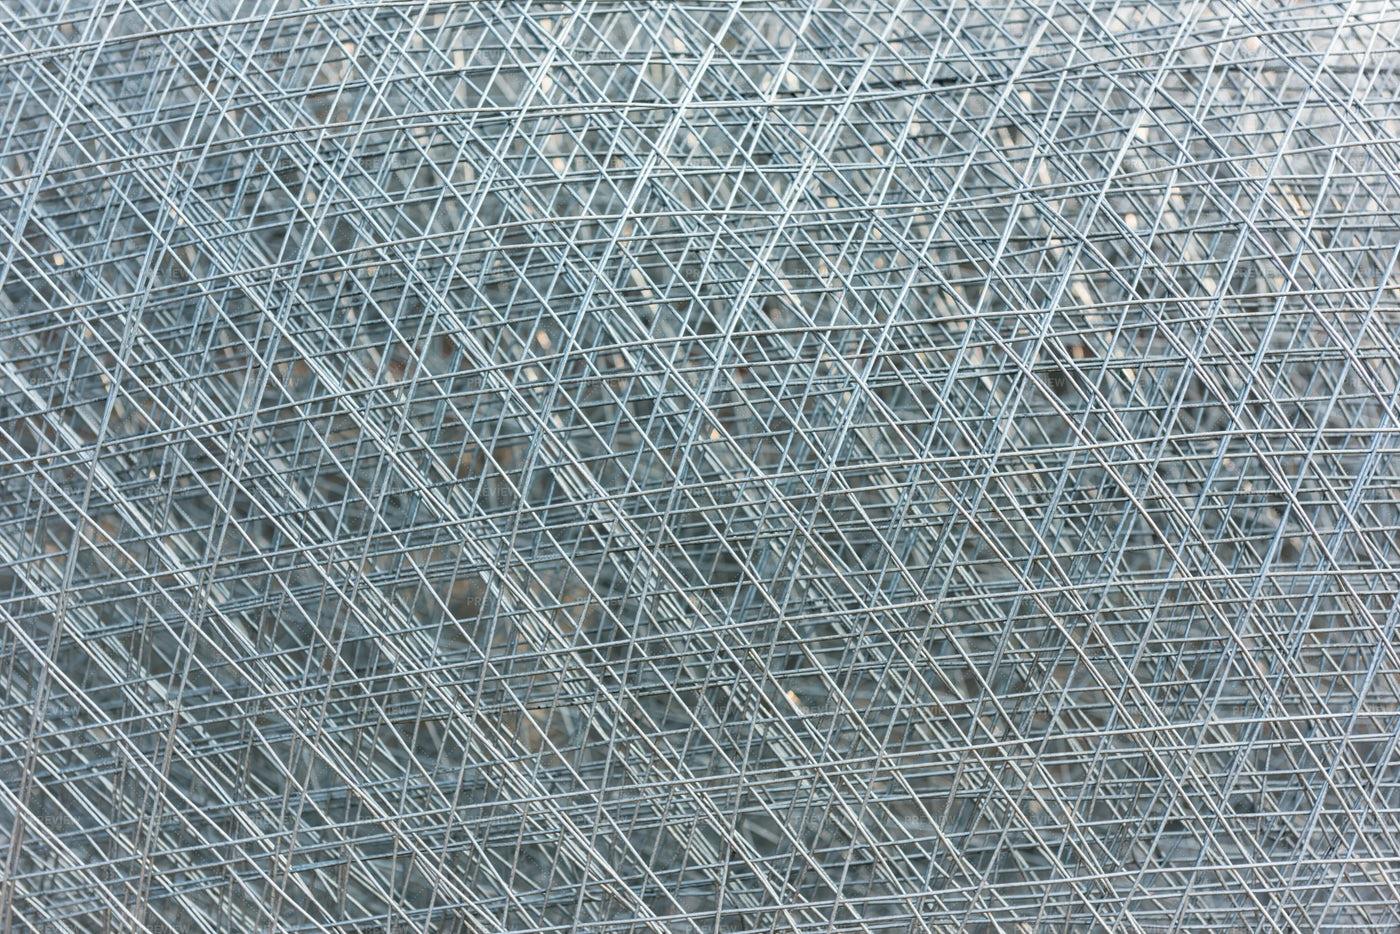 Reinforced Metal Grid: Stock Photos